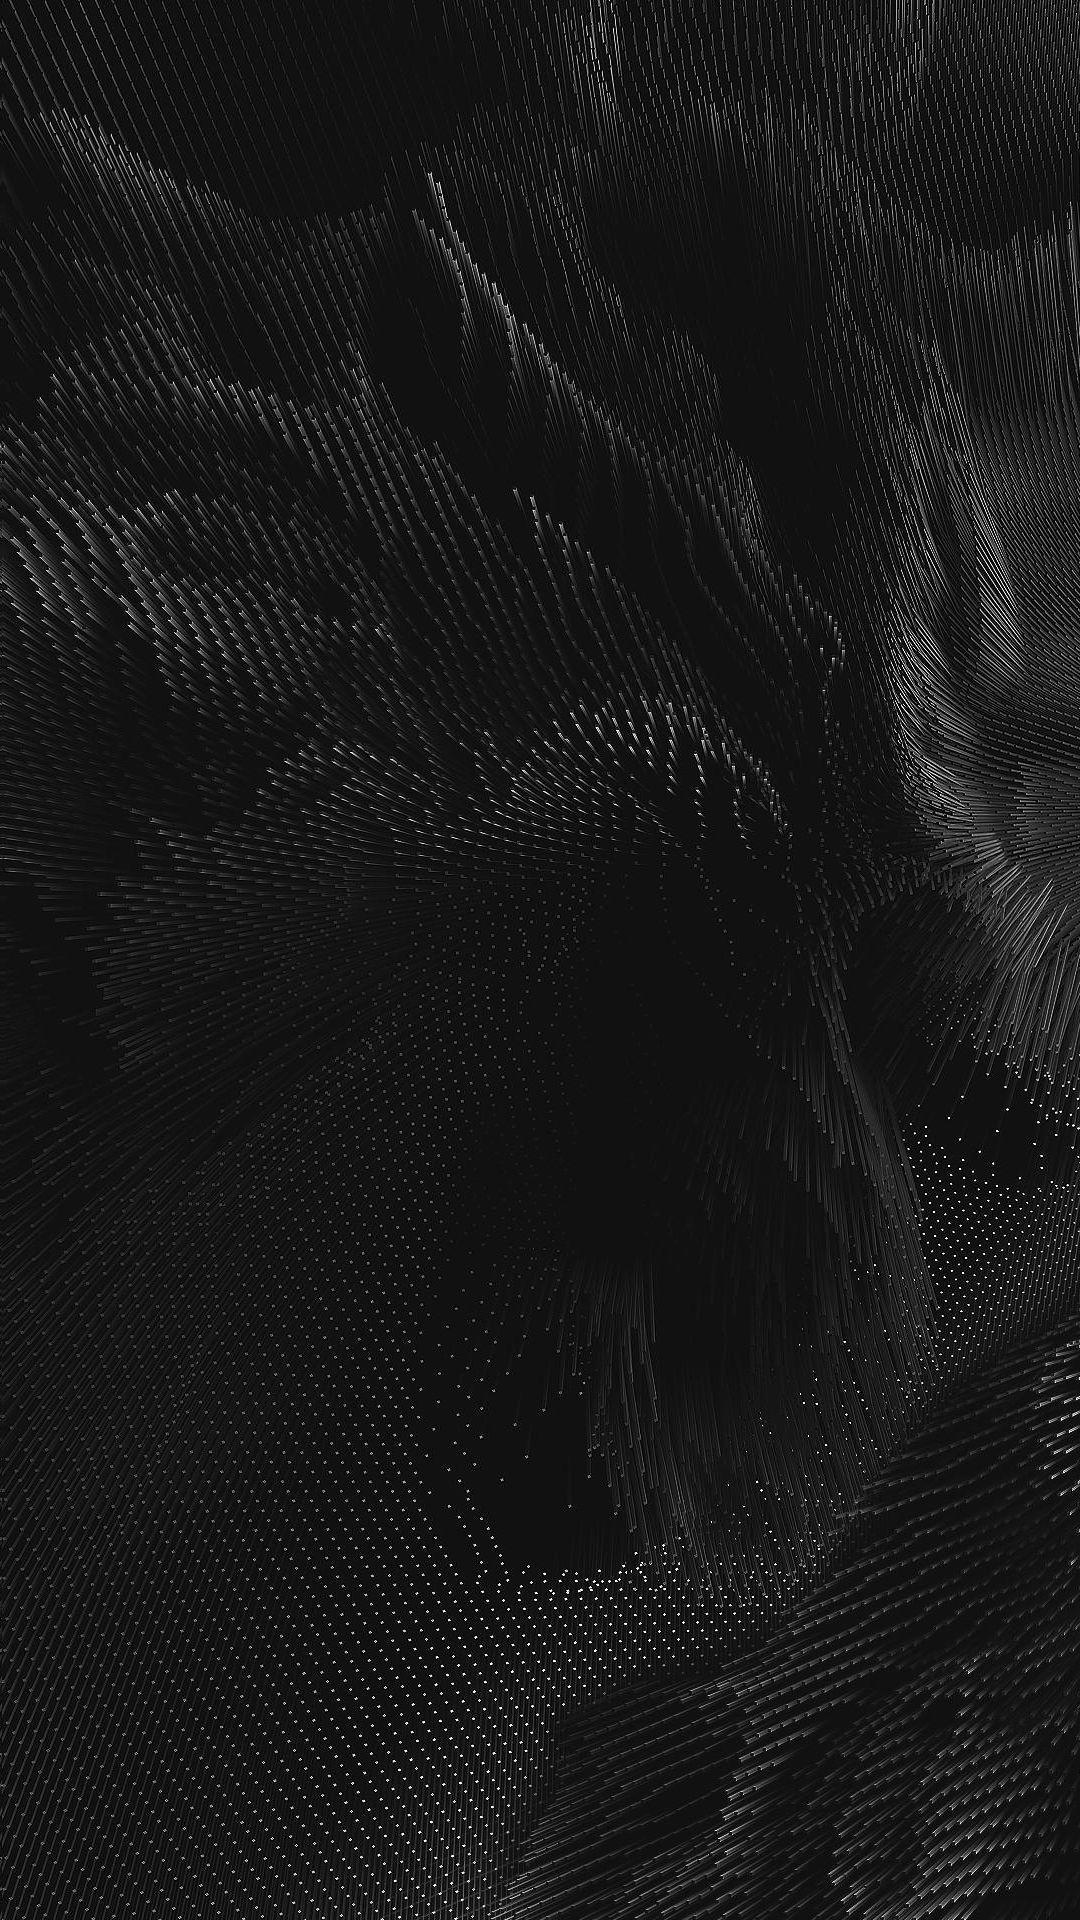 Iphone Wallpaper 4k Dark